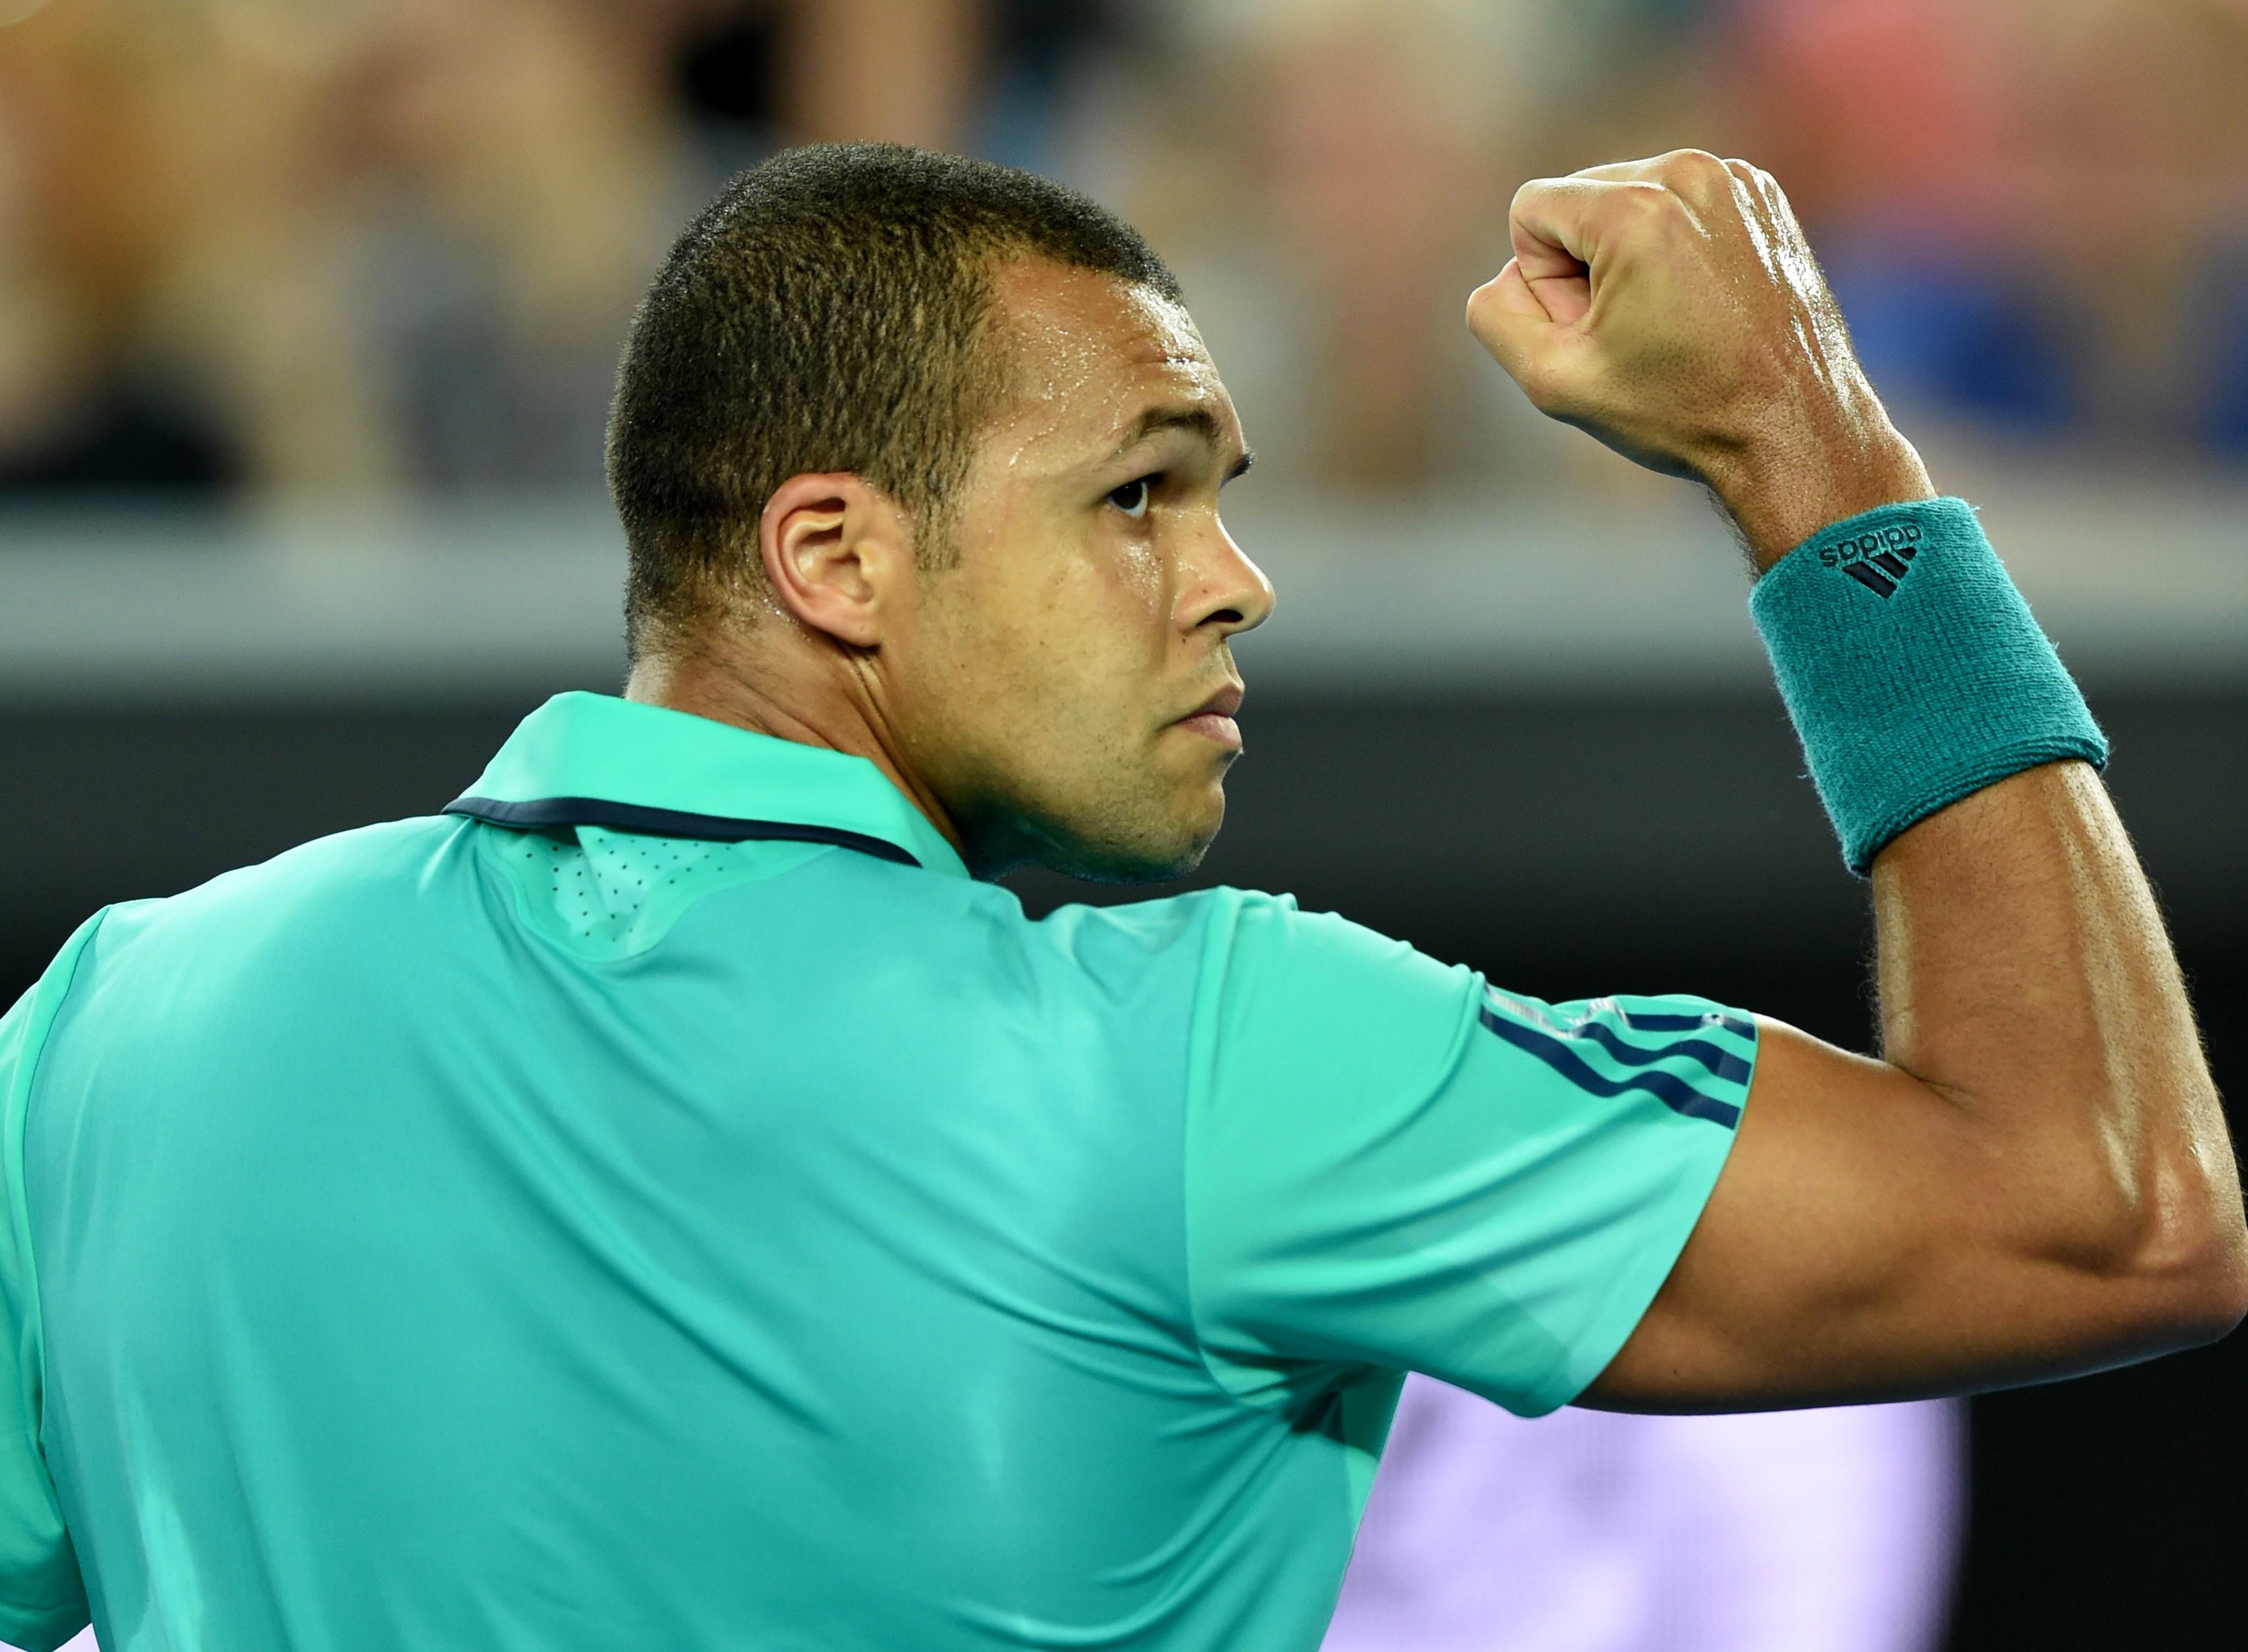 Tennis - Open Australie - Tsonga et Simon solides, Benneteau et Mathieu K.O